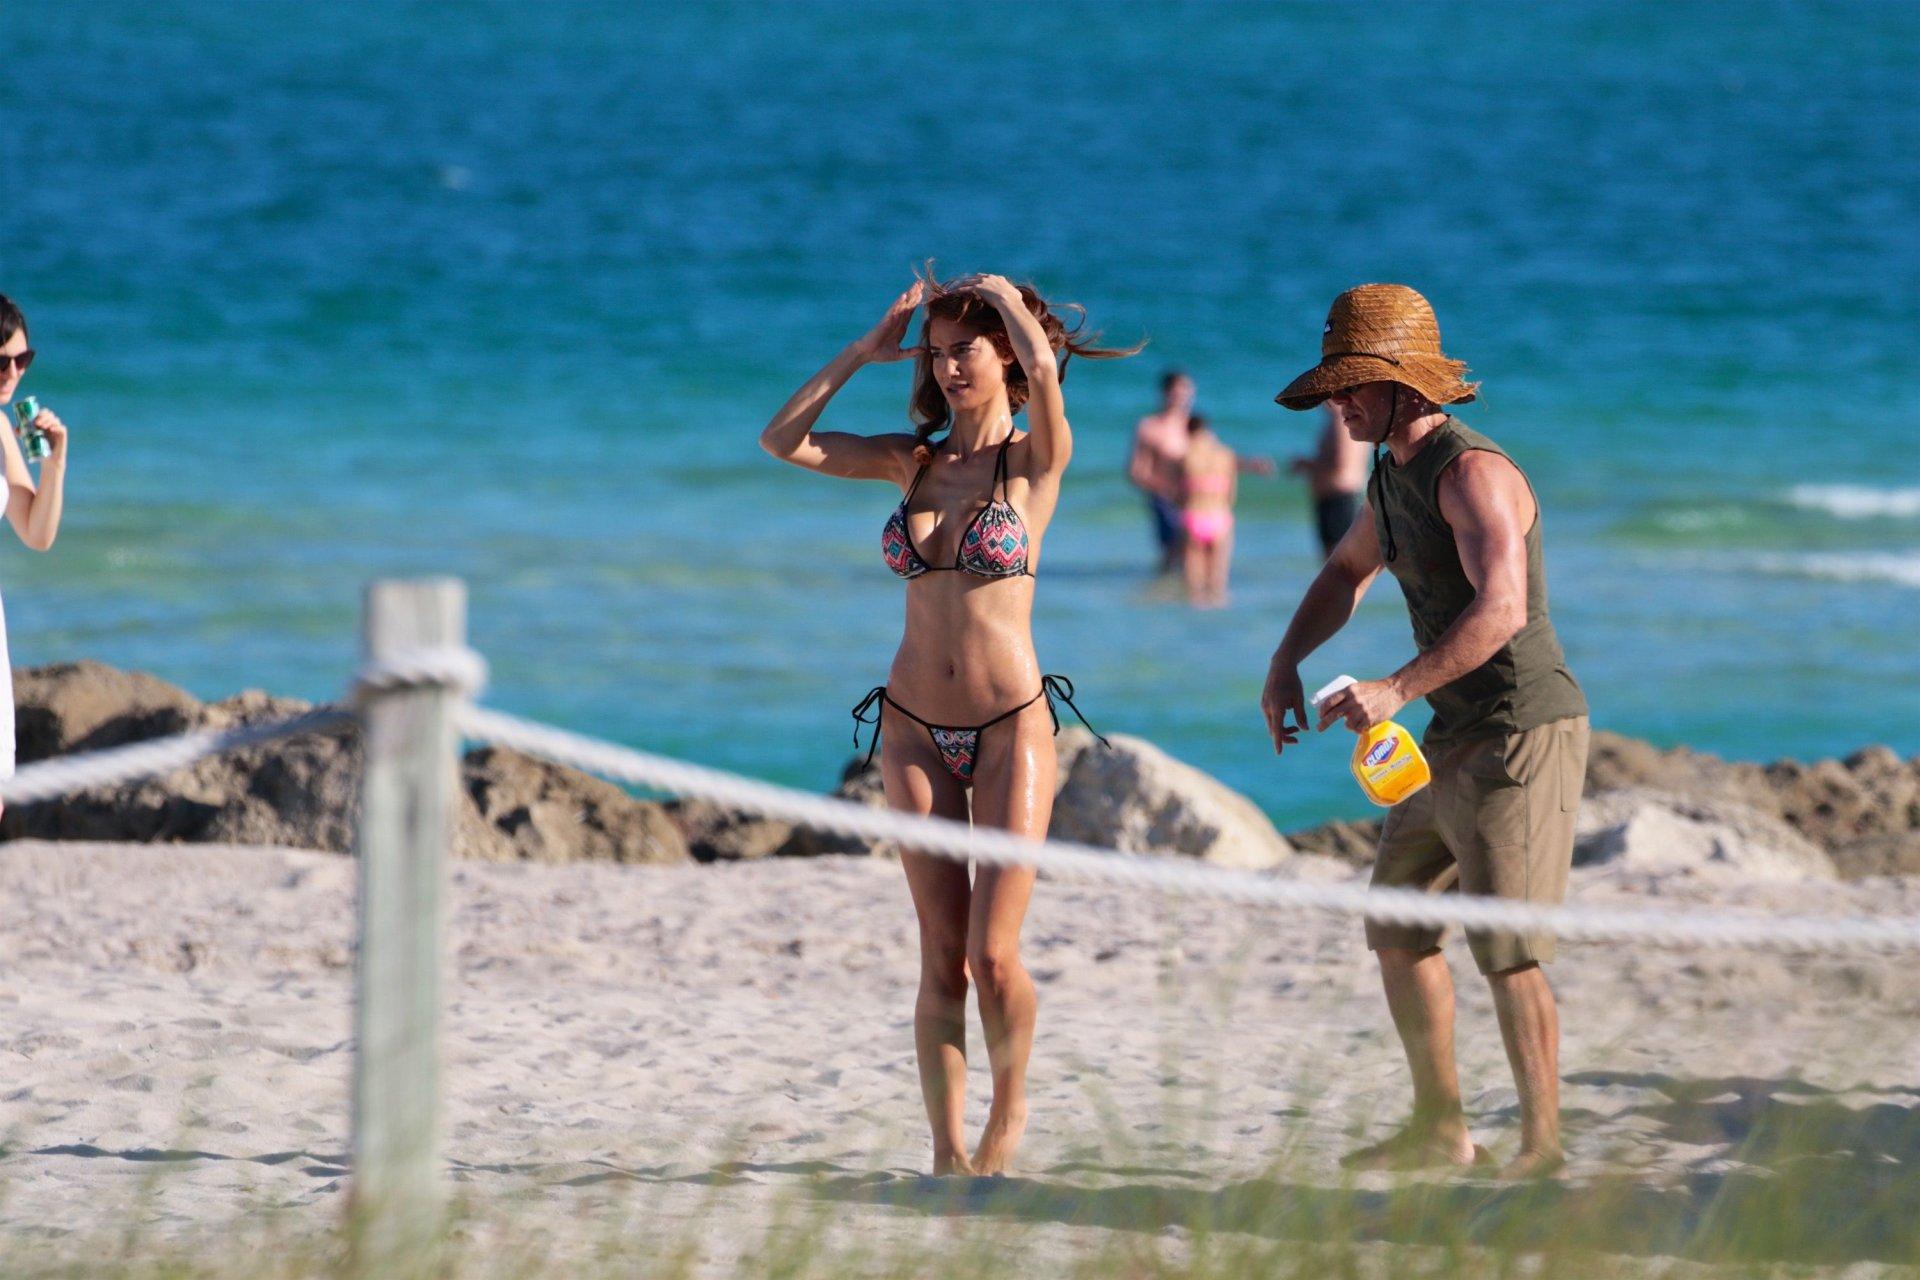 Alyssa arce sexy,Cara Maria Sorbello. 2018-2019 celebrityes photos leaks! Sex gallery Rambo Suicidegirls Fappening,Tatiana dieteman topless